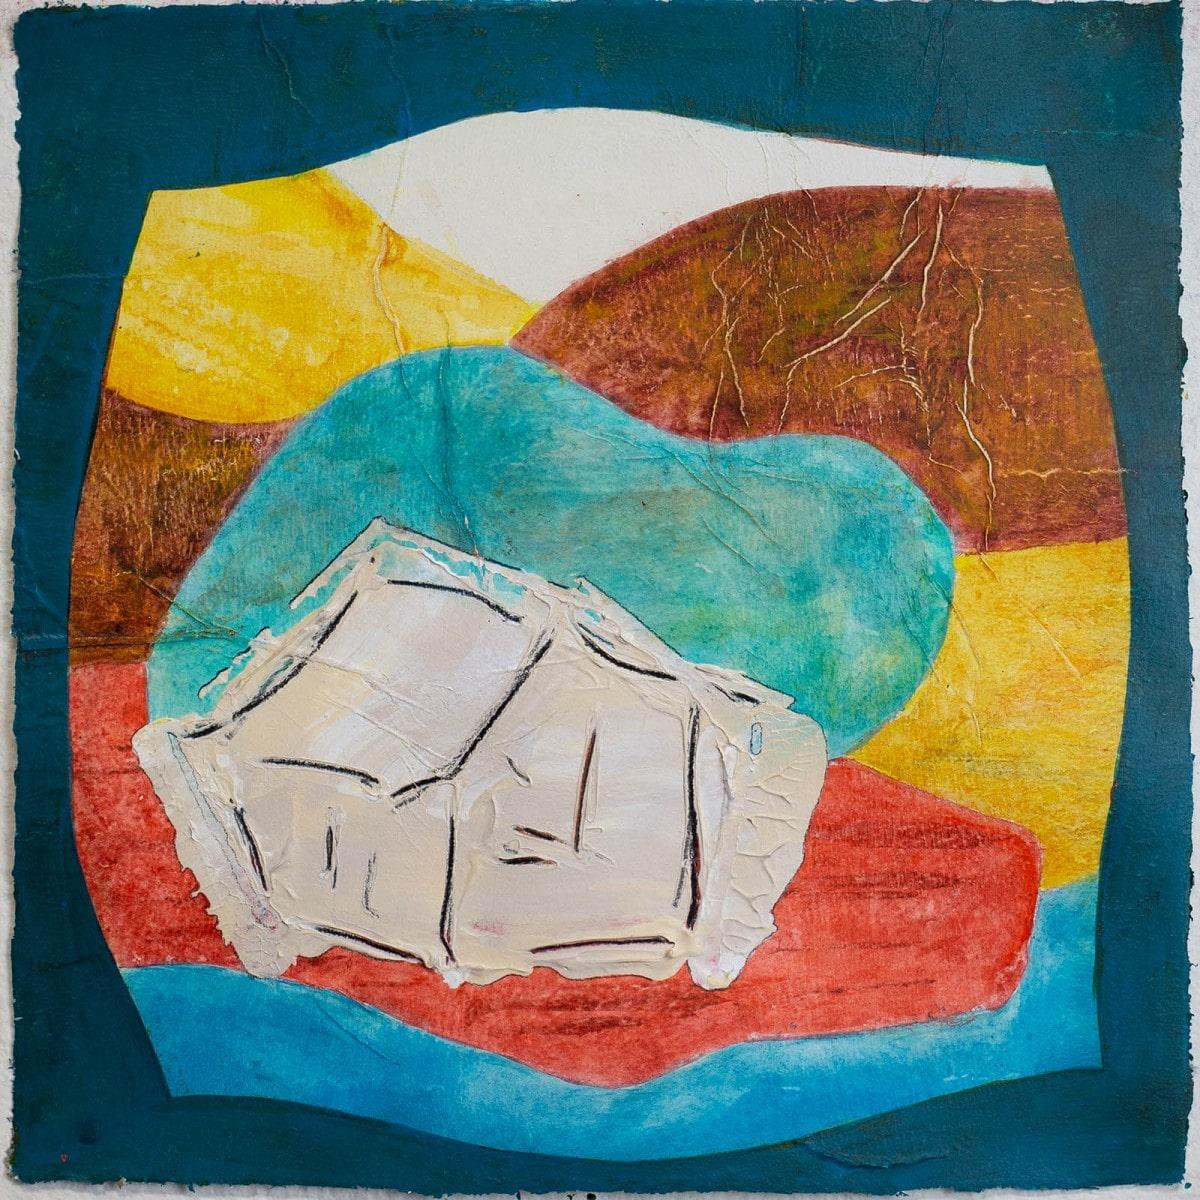 Mountain Idyll No. 01 with Water Bubble // Acry, Ölkreide auf Papier, 23 x 23 cm, 2021